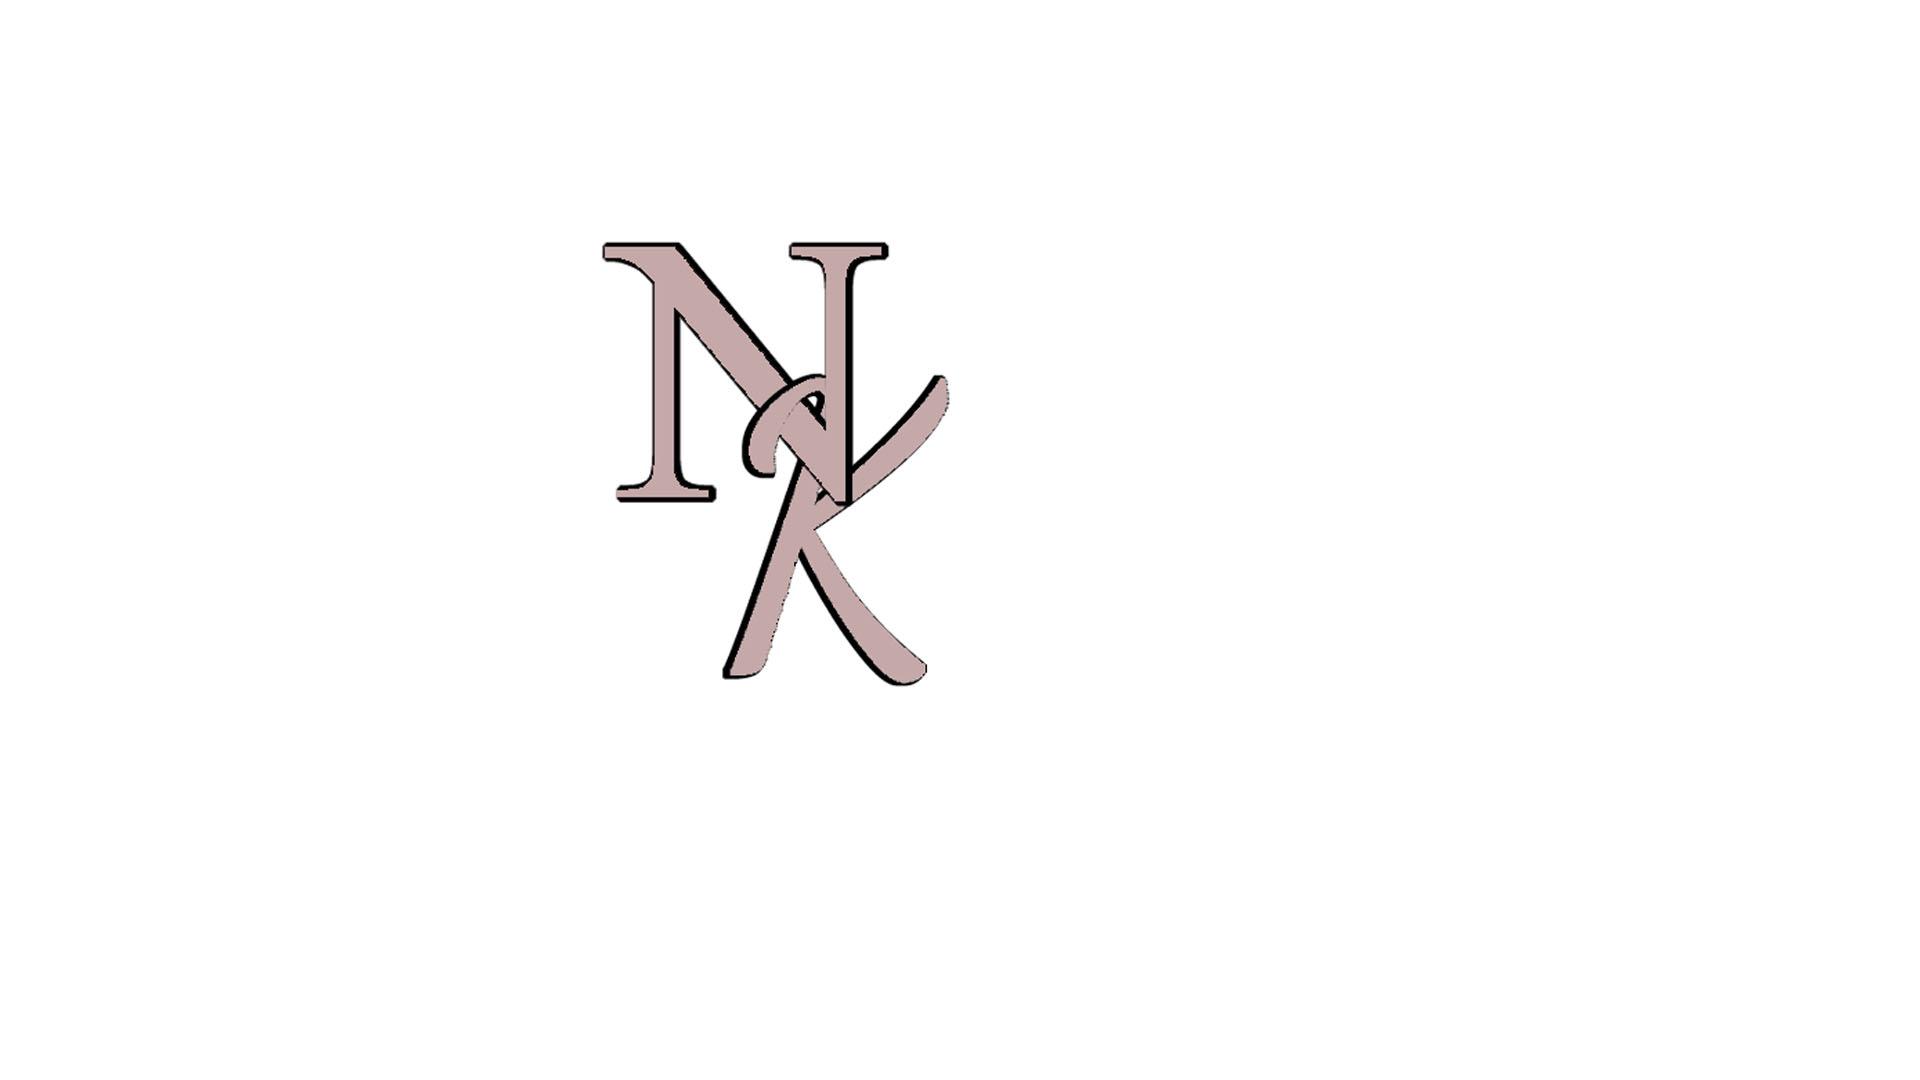 Логотип, товарный знак. Далее разработка brend booka компани фото f_7845ce32971d6491.jpg